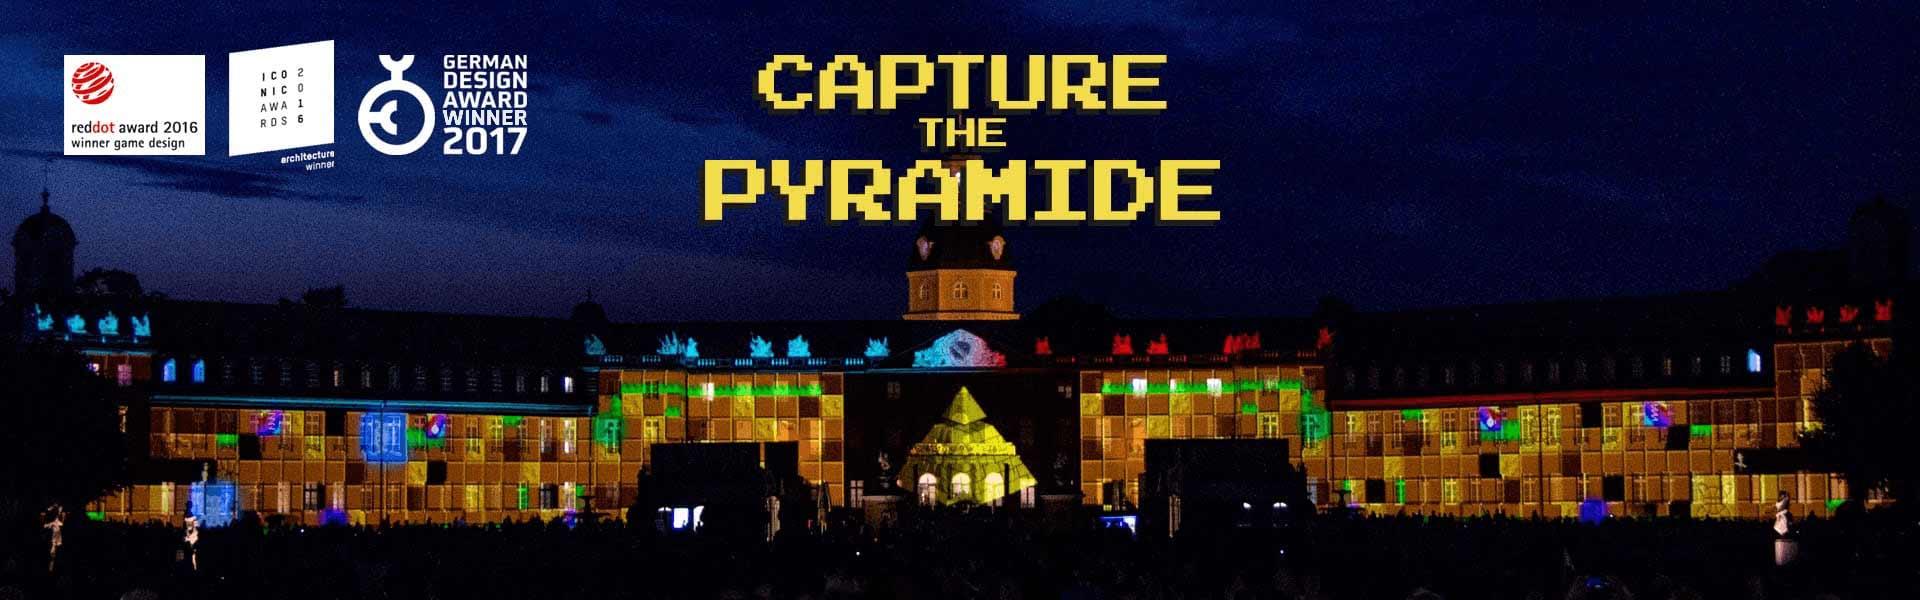 Capture_the_Pyramide_pong_li_5